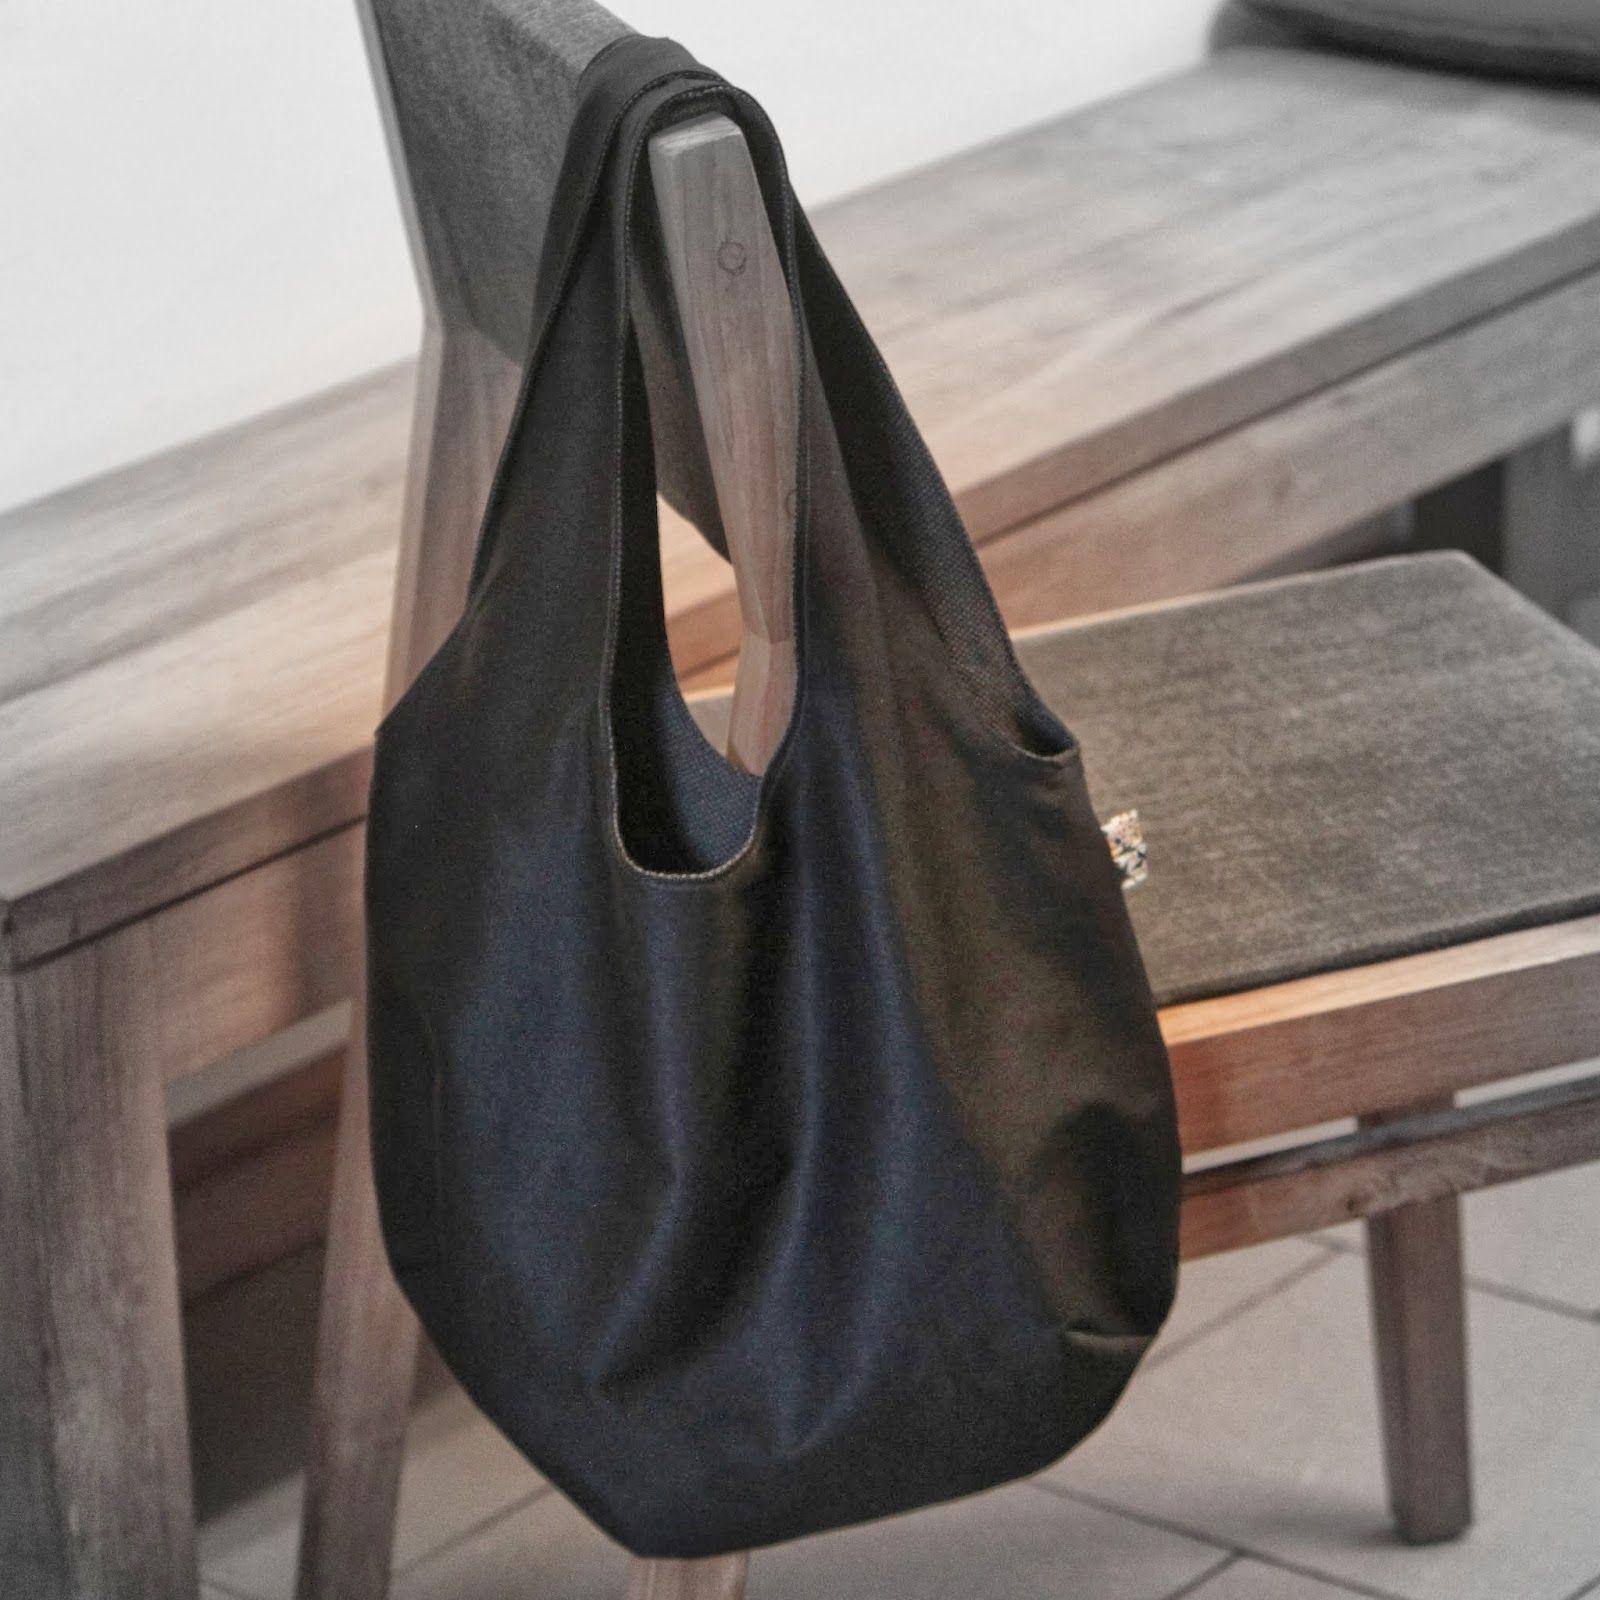 Sac main r versible tutoriel reversible shopping bag tutorial id es couture - Couture sac a main ...